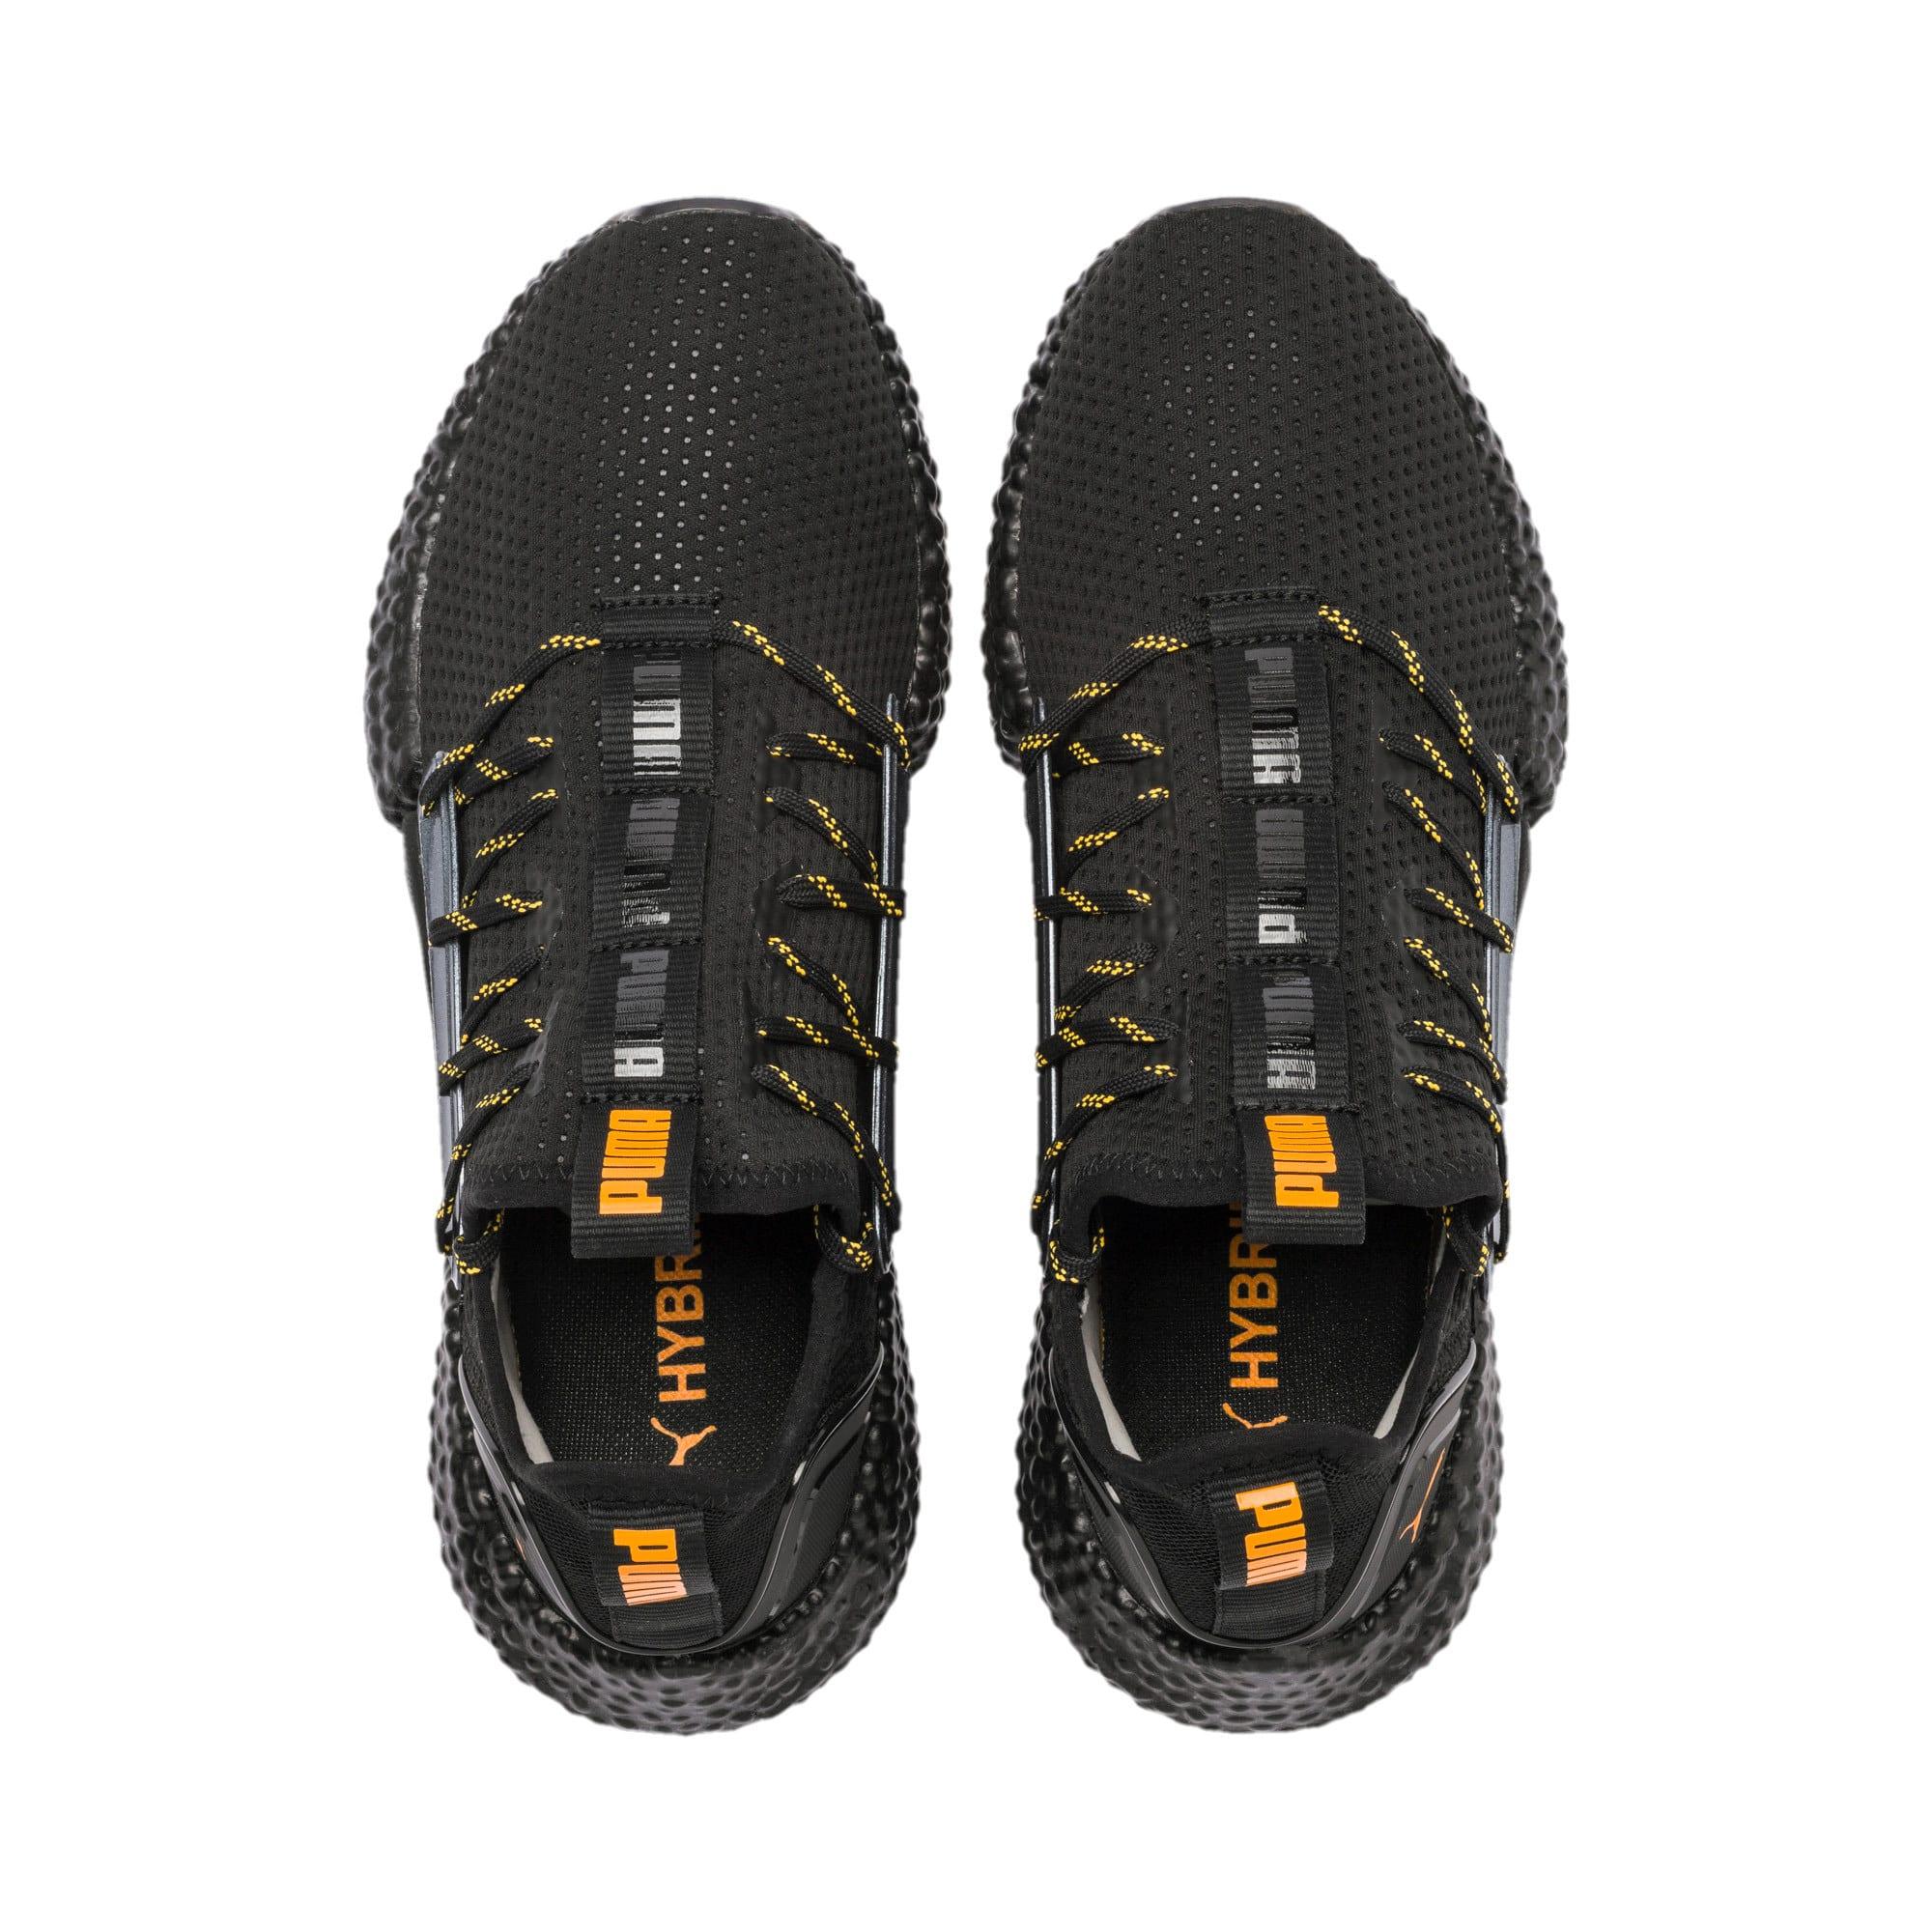 Thumbnail 7 of HYBRID Rocket Aero Men's Sneakers, Puma Black-Puma Black, medium